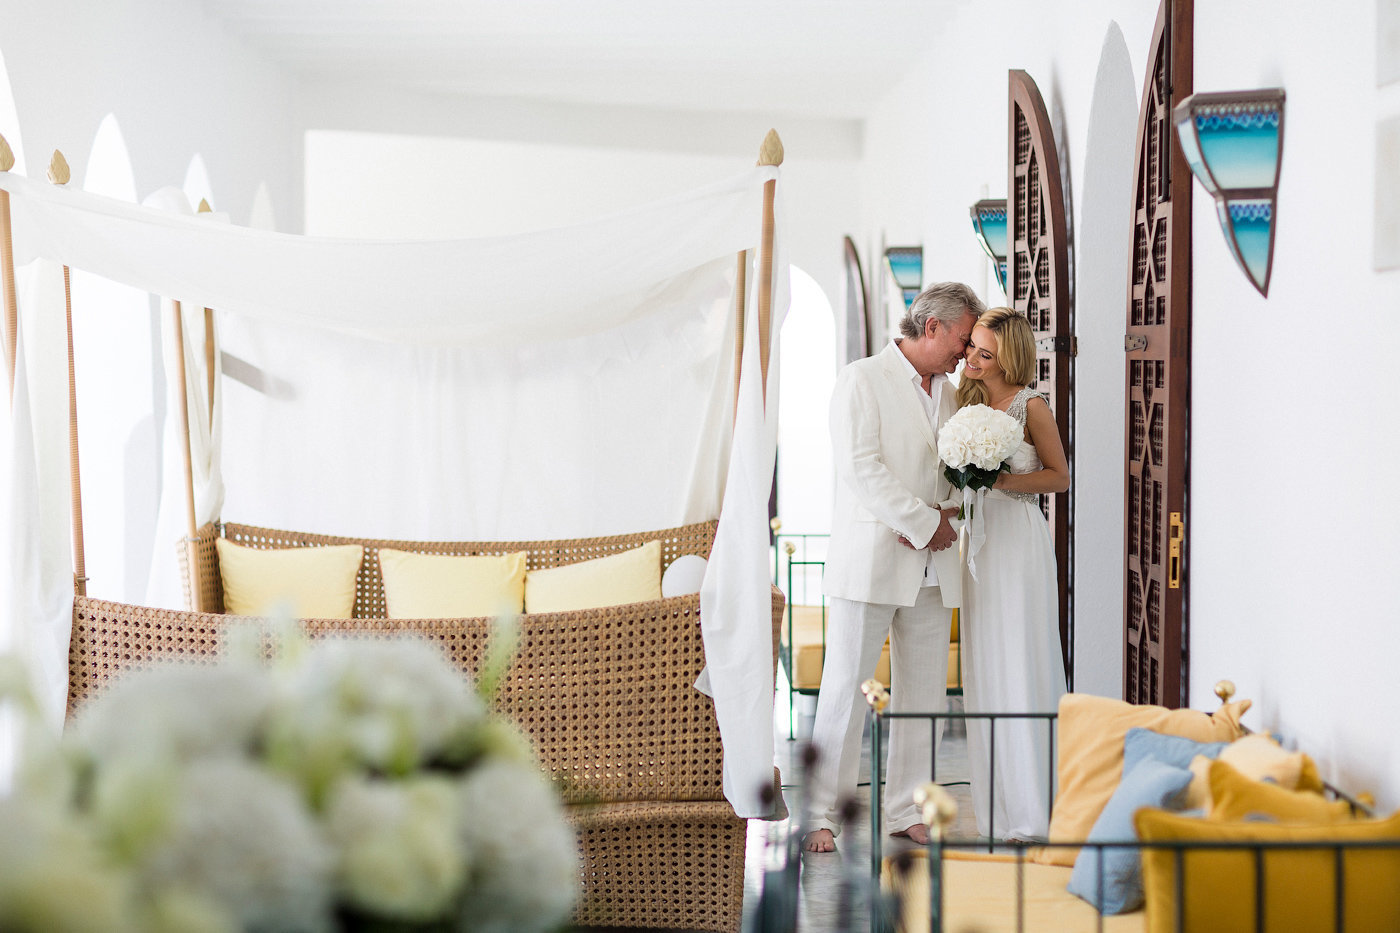 Christina_Eduard_Photography_Ibiza_Hochzeit_007